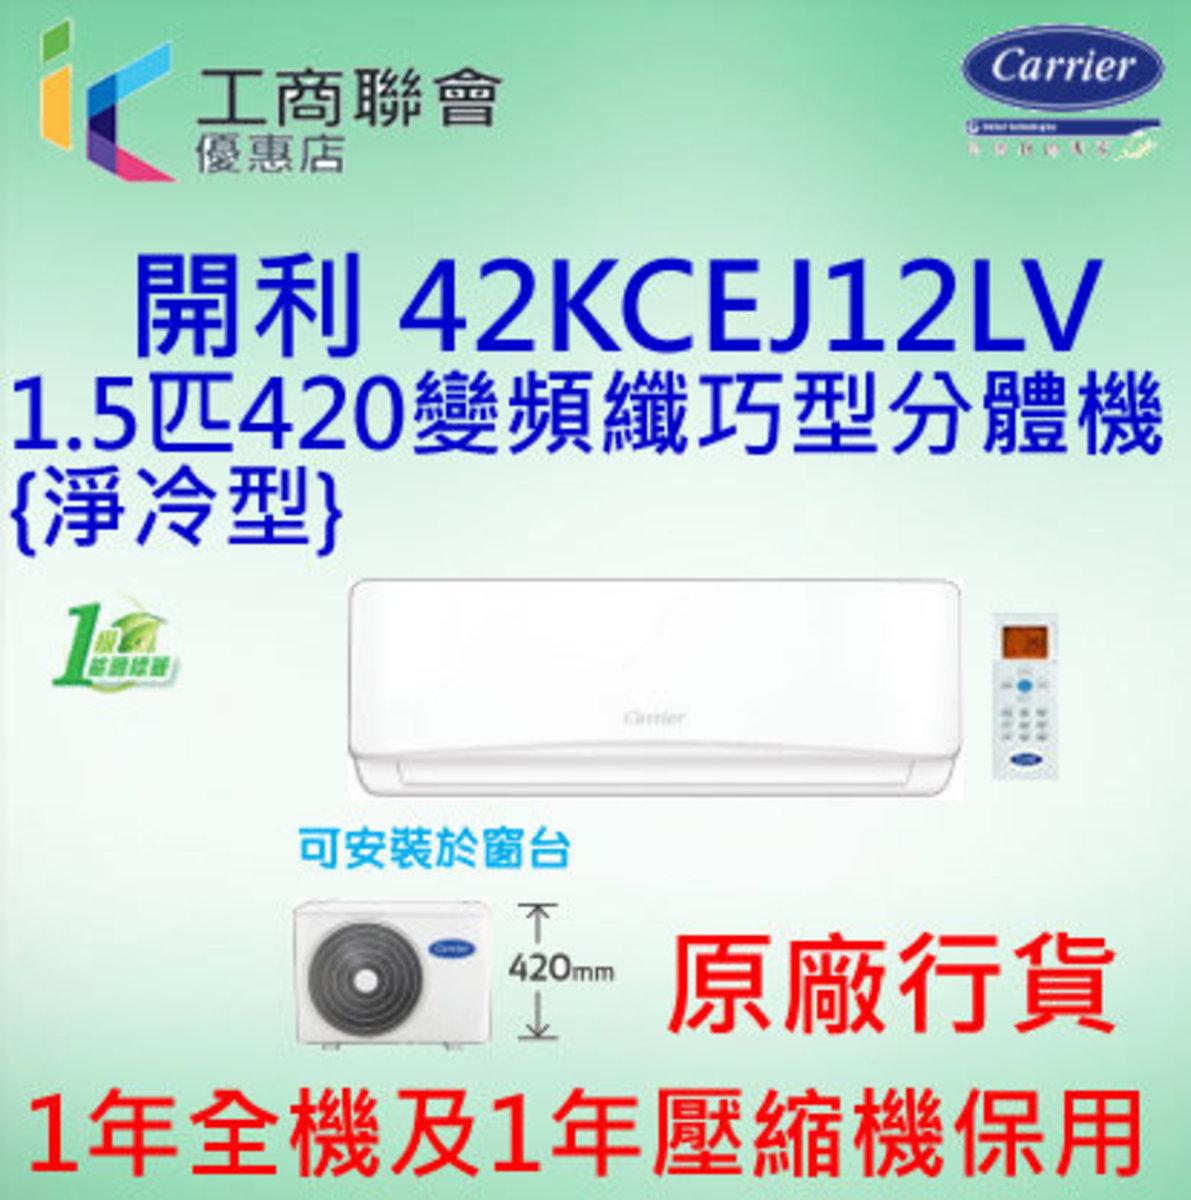 42KCEJ12LV 1.5 420 variable frequency fiber split machine (net cold type)